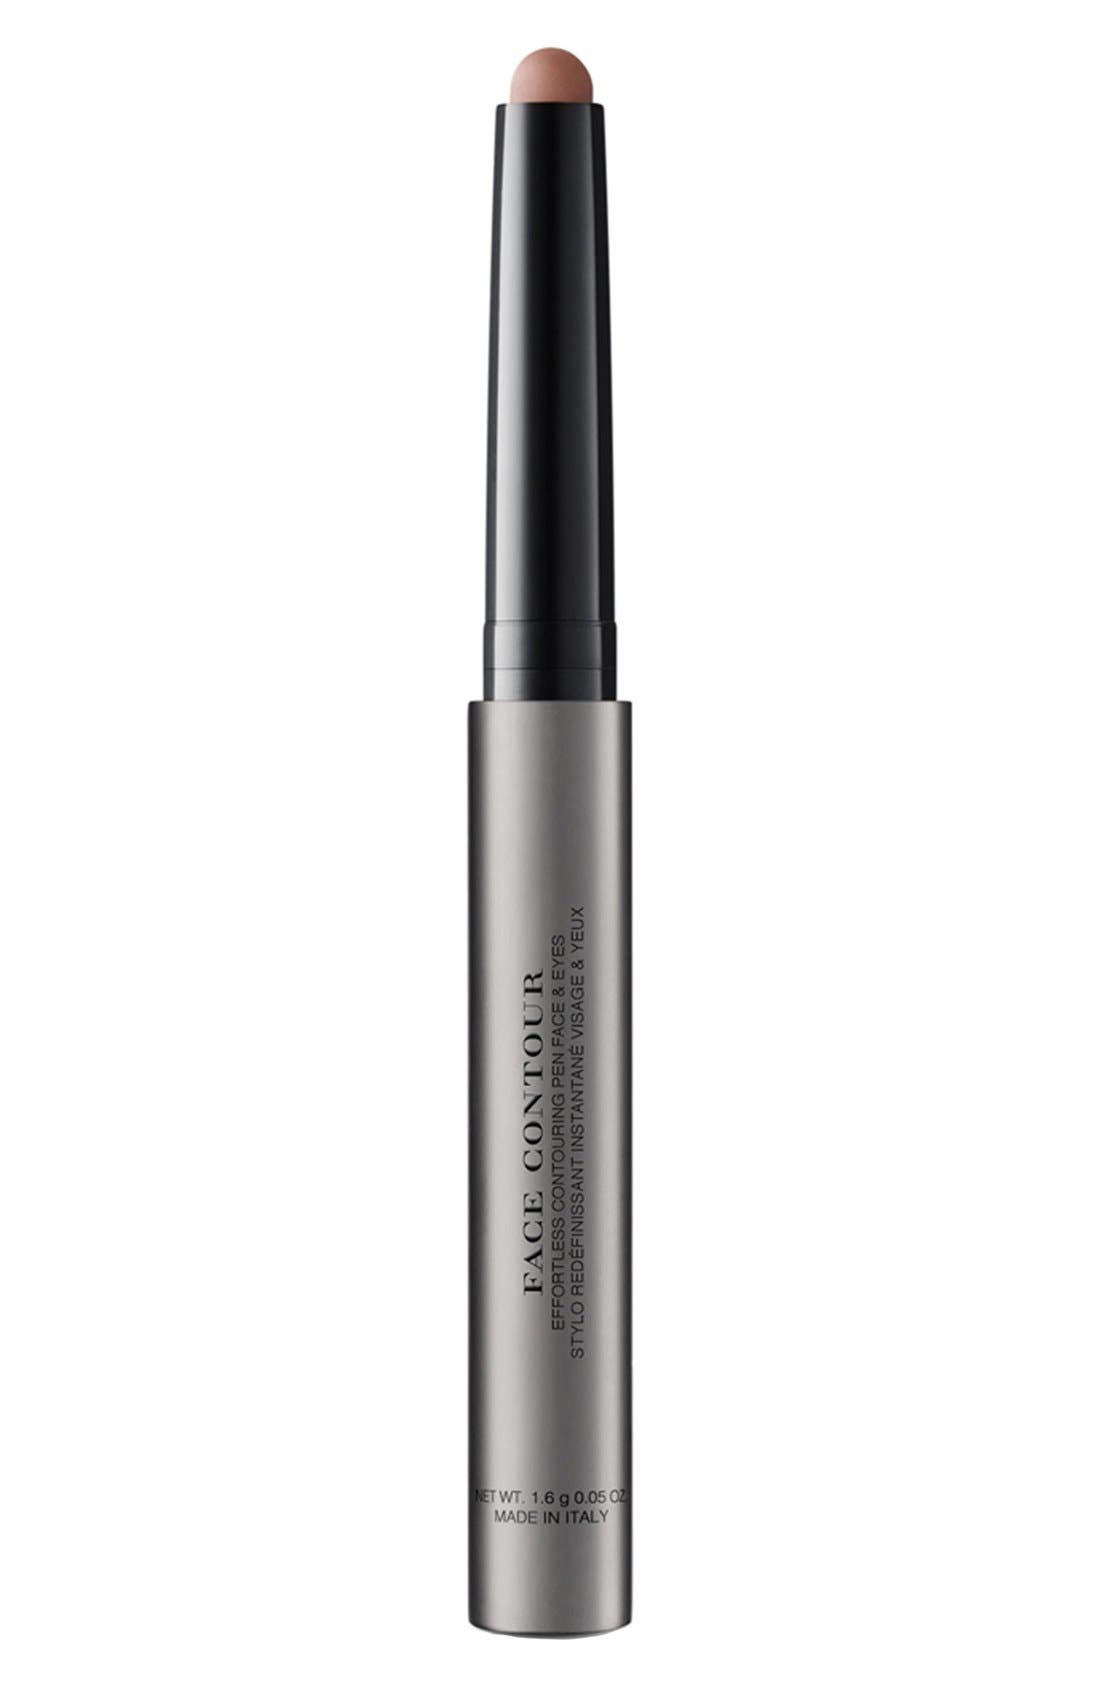 Burberry Beauty Face Contour Effortless Contouring Pen for Face & Eyes